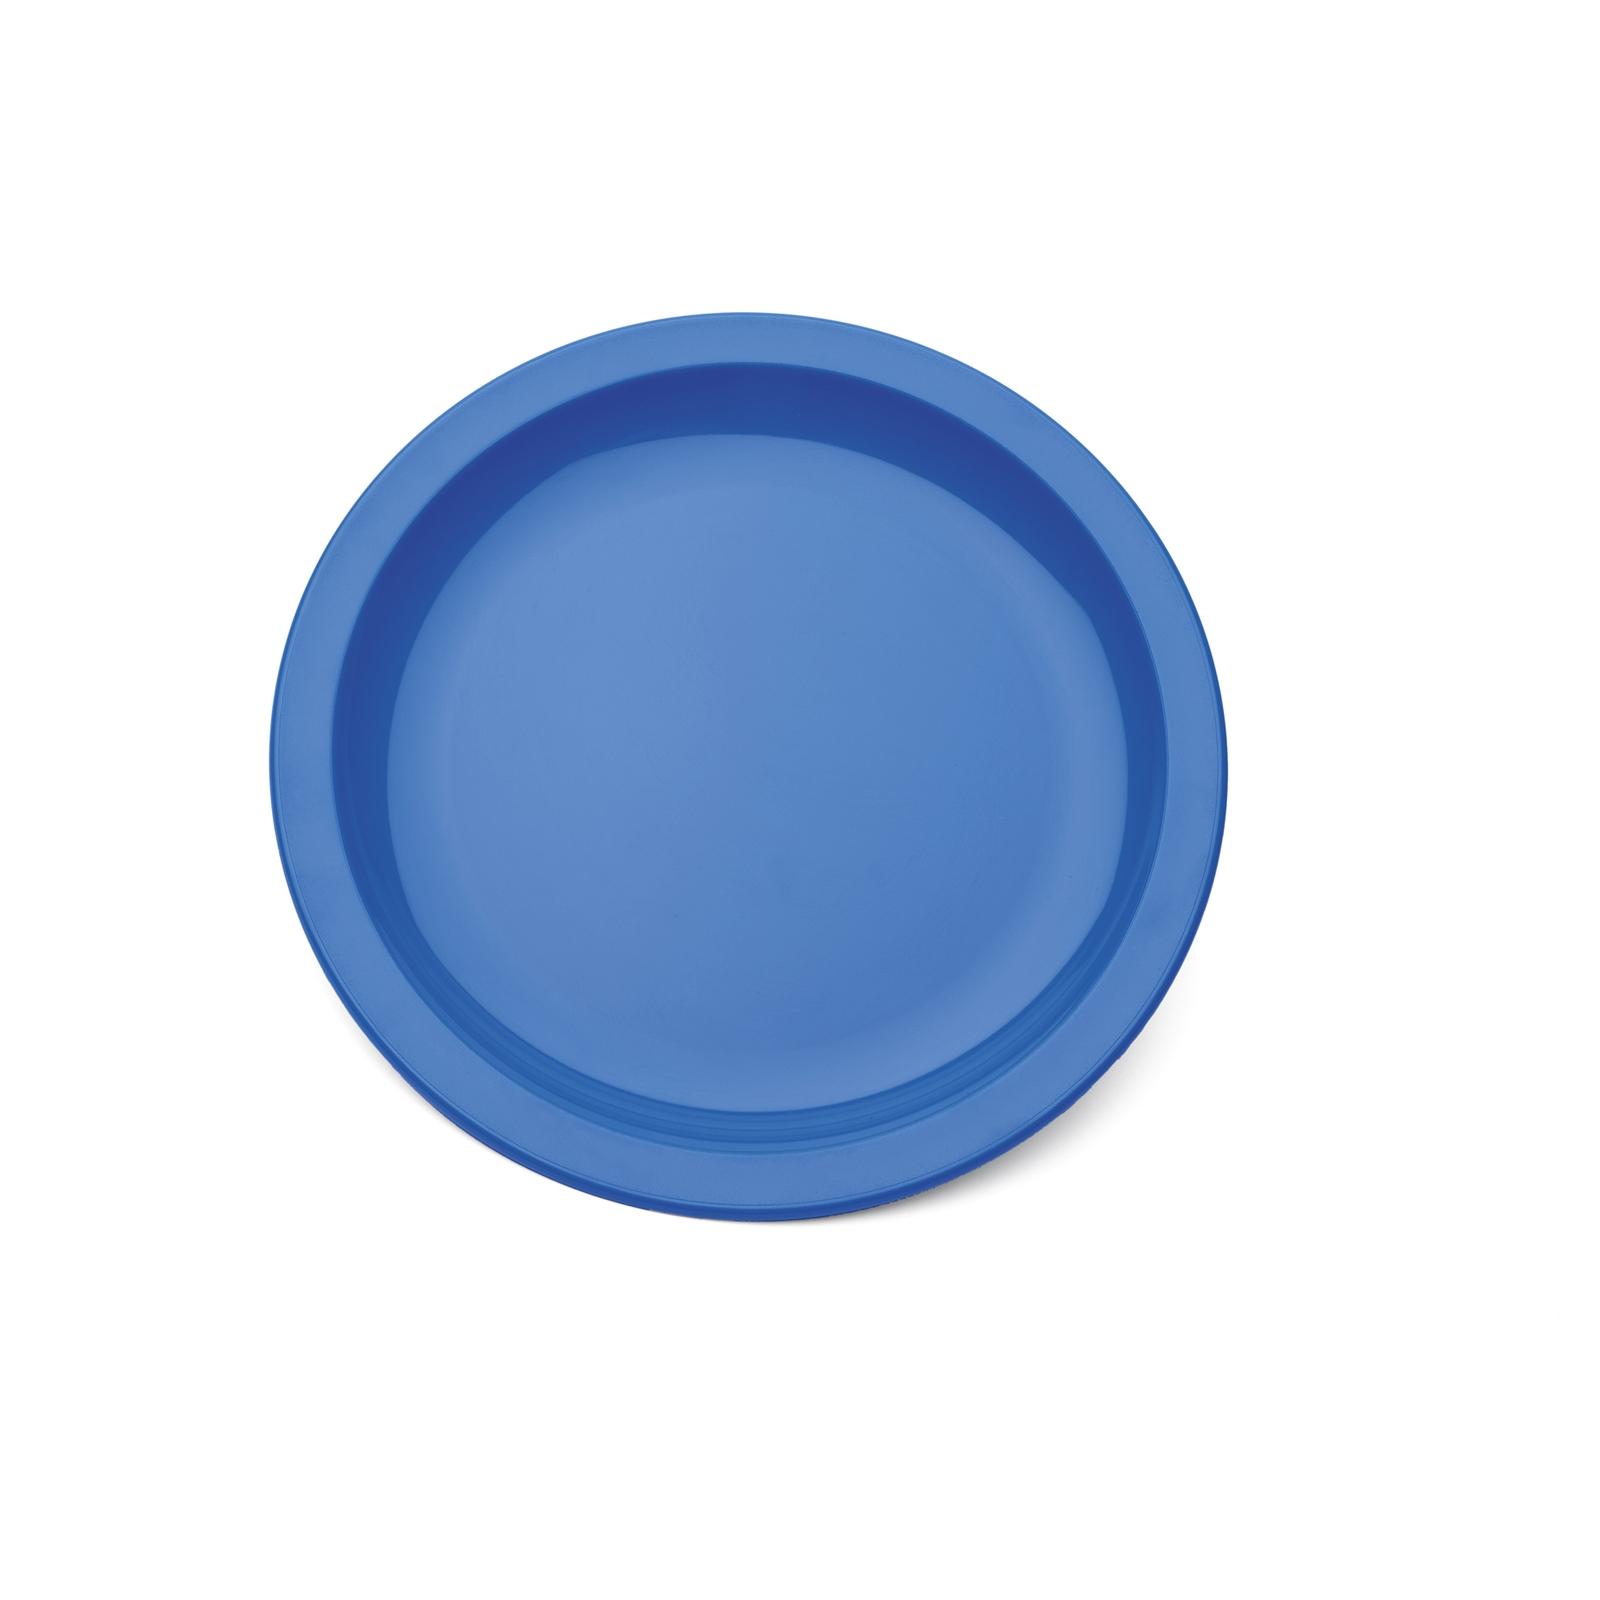 Polycarb Plate 225mm - Blue